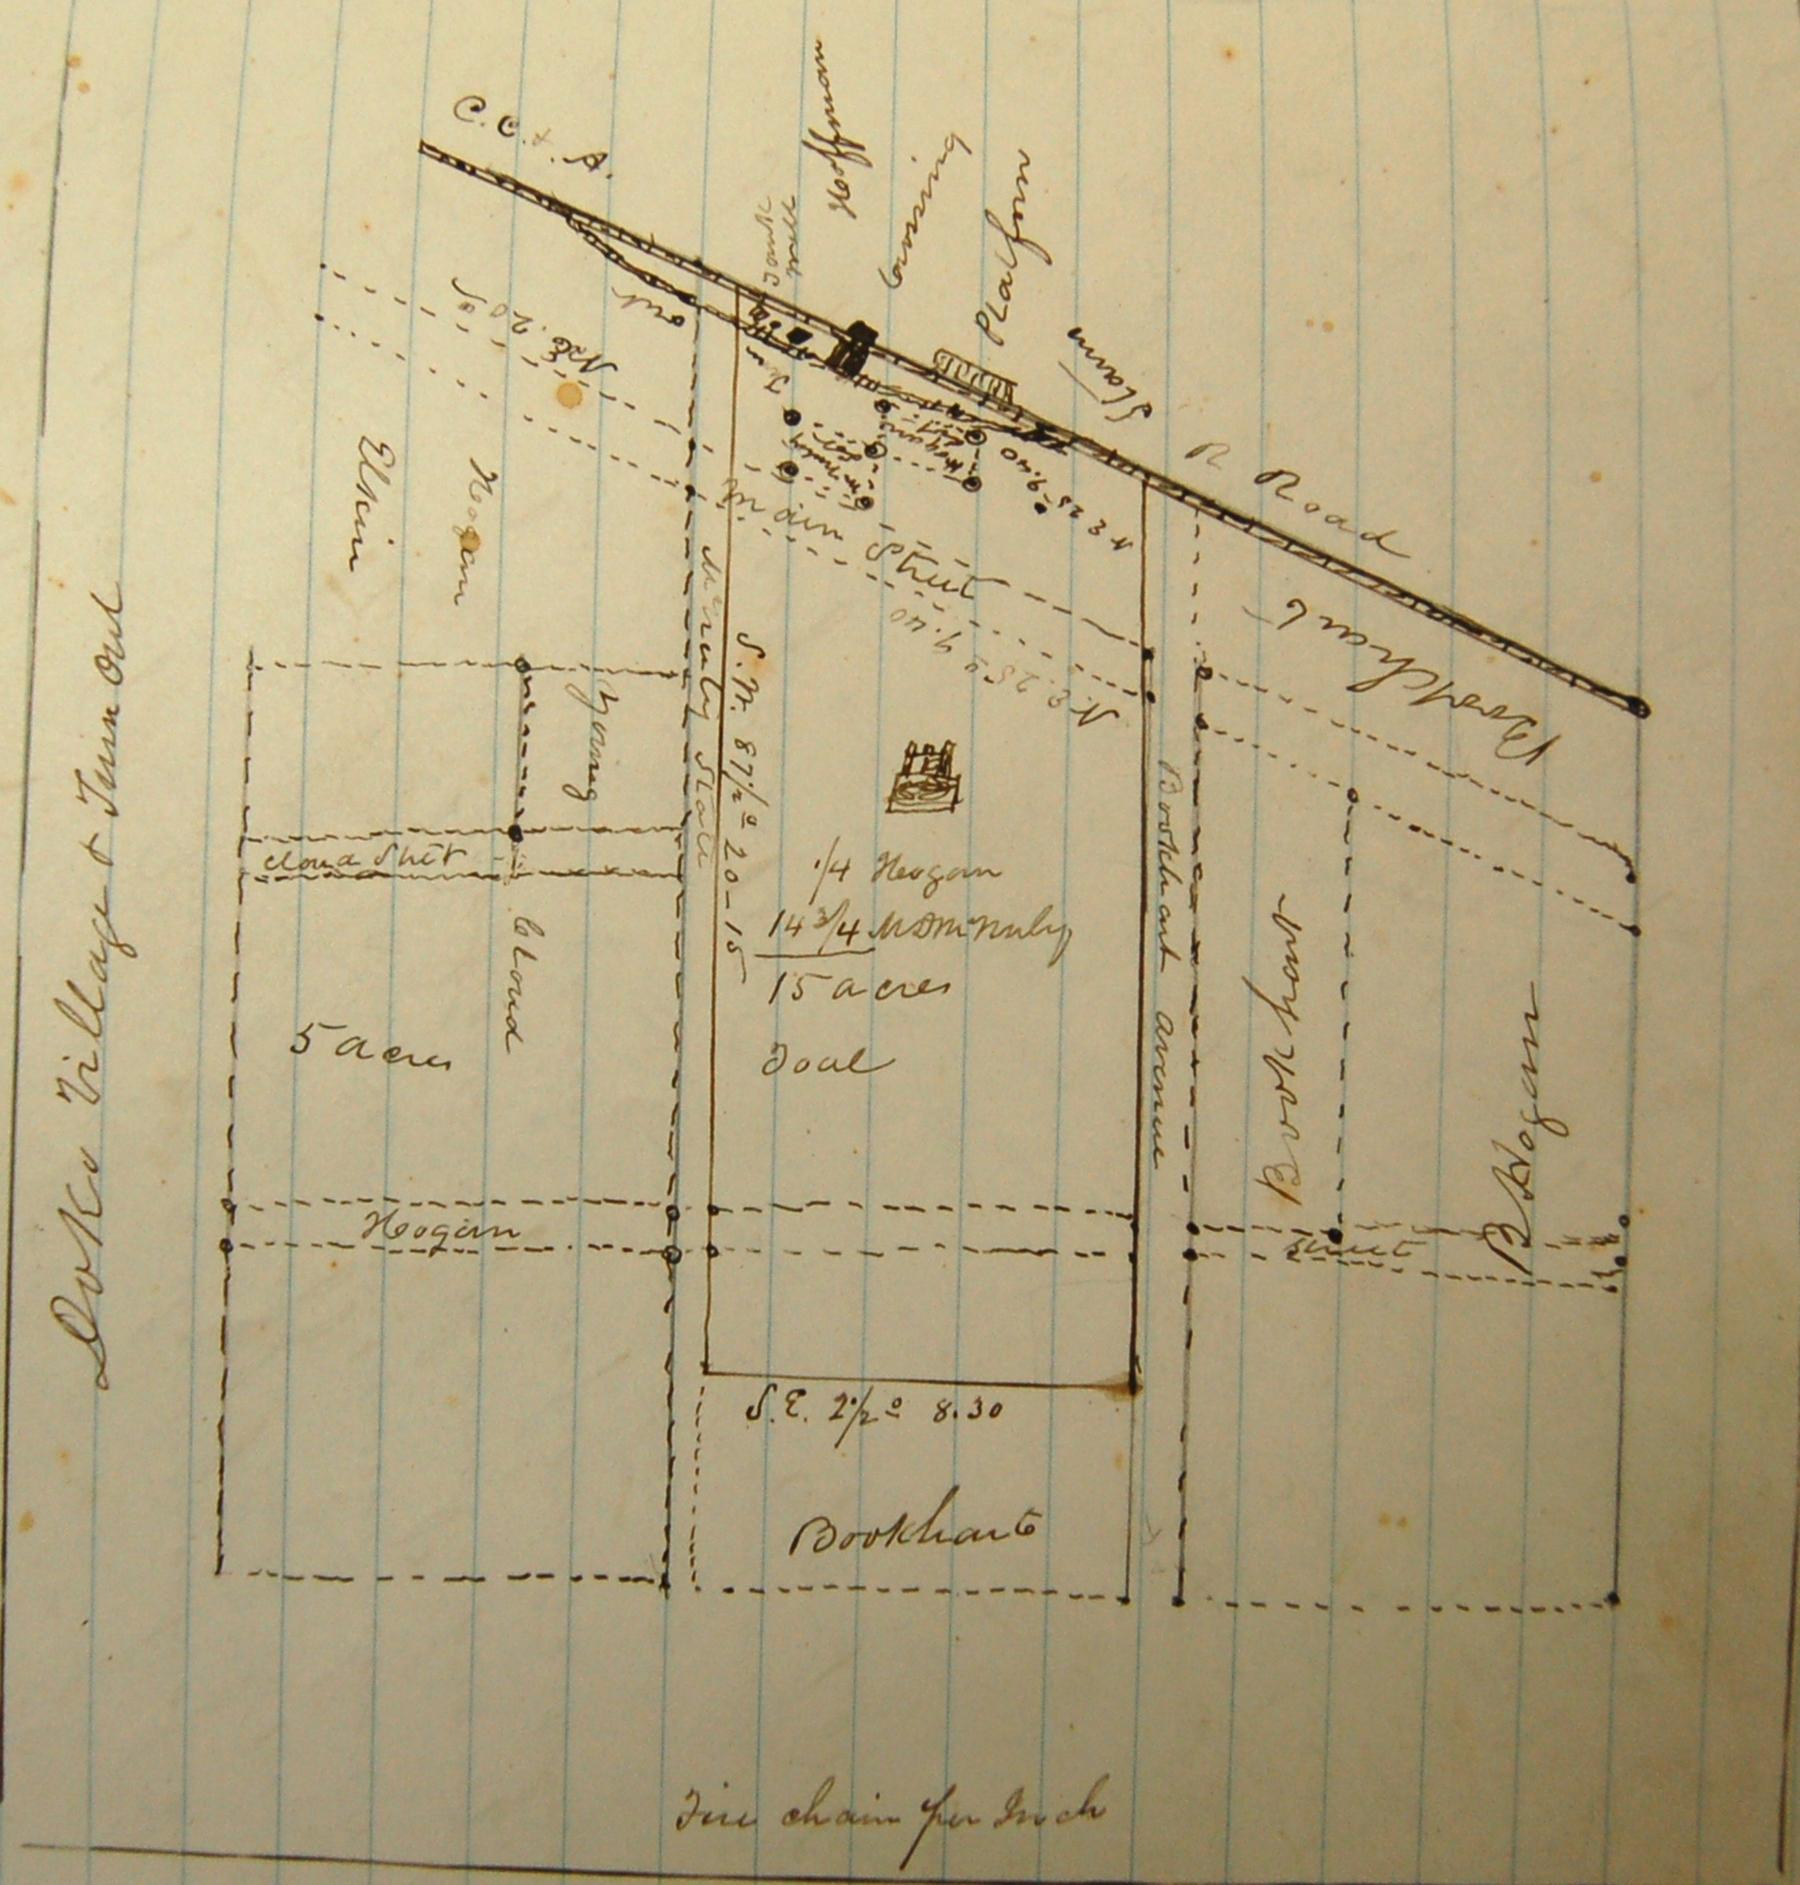 Early Doke Map and Deed 002.jpg